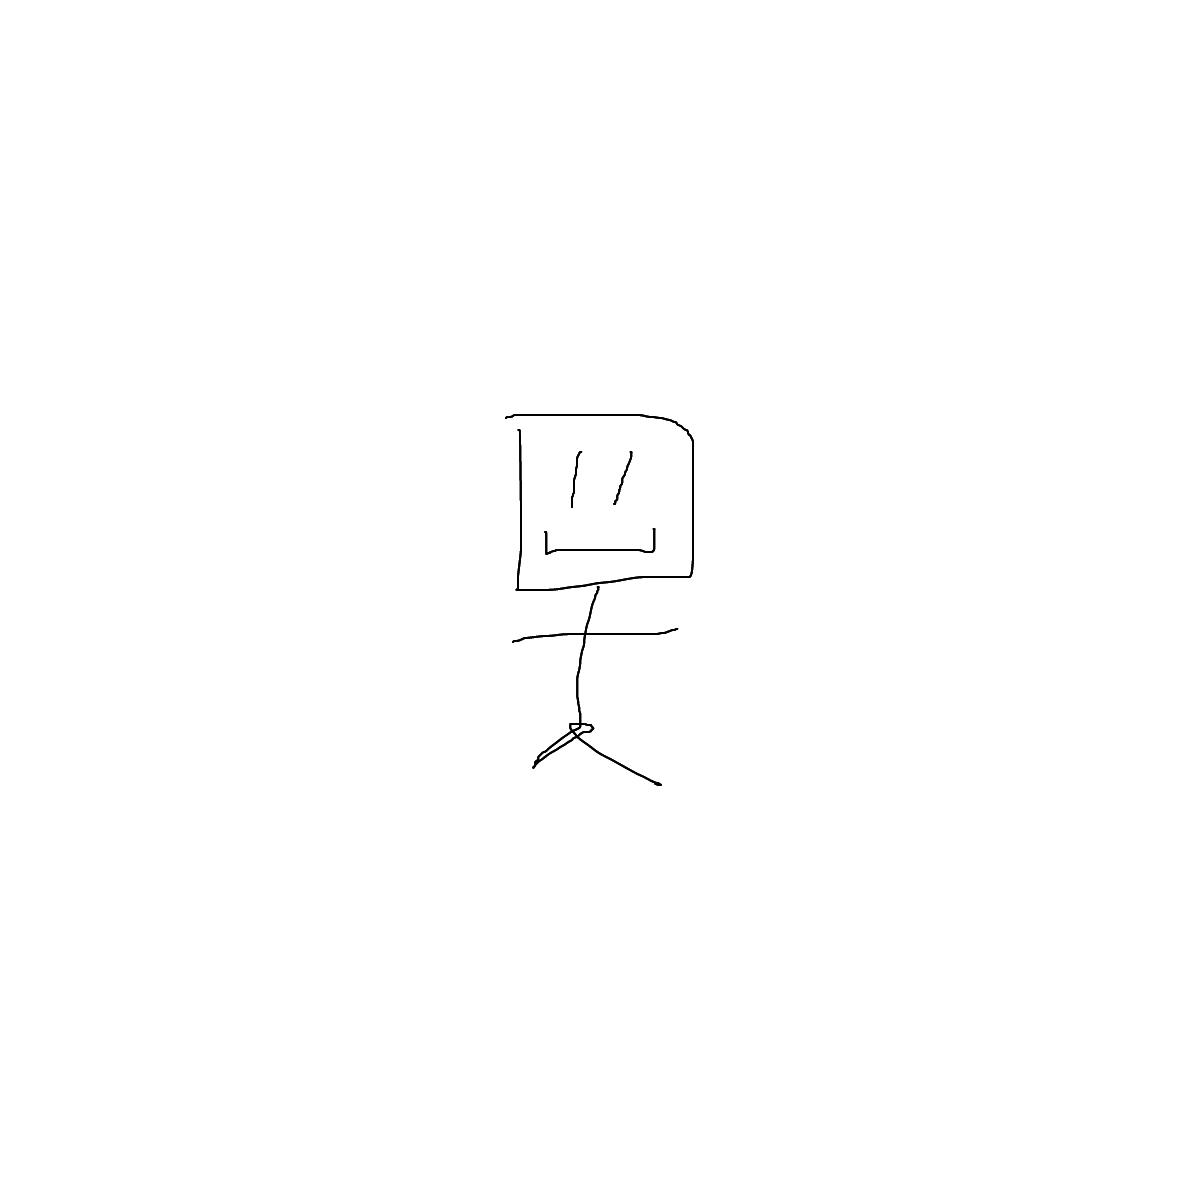 BAAAM drawing#2964 lat:52.2330627441406250lng: 20.9982395172119140